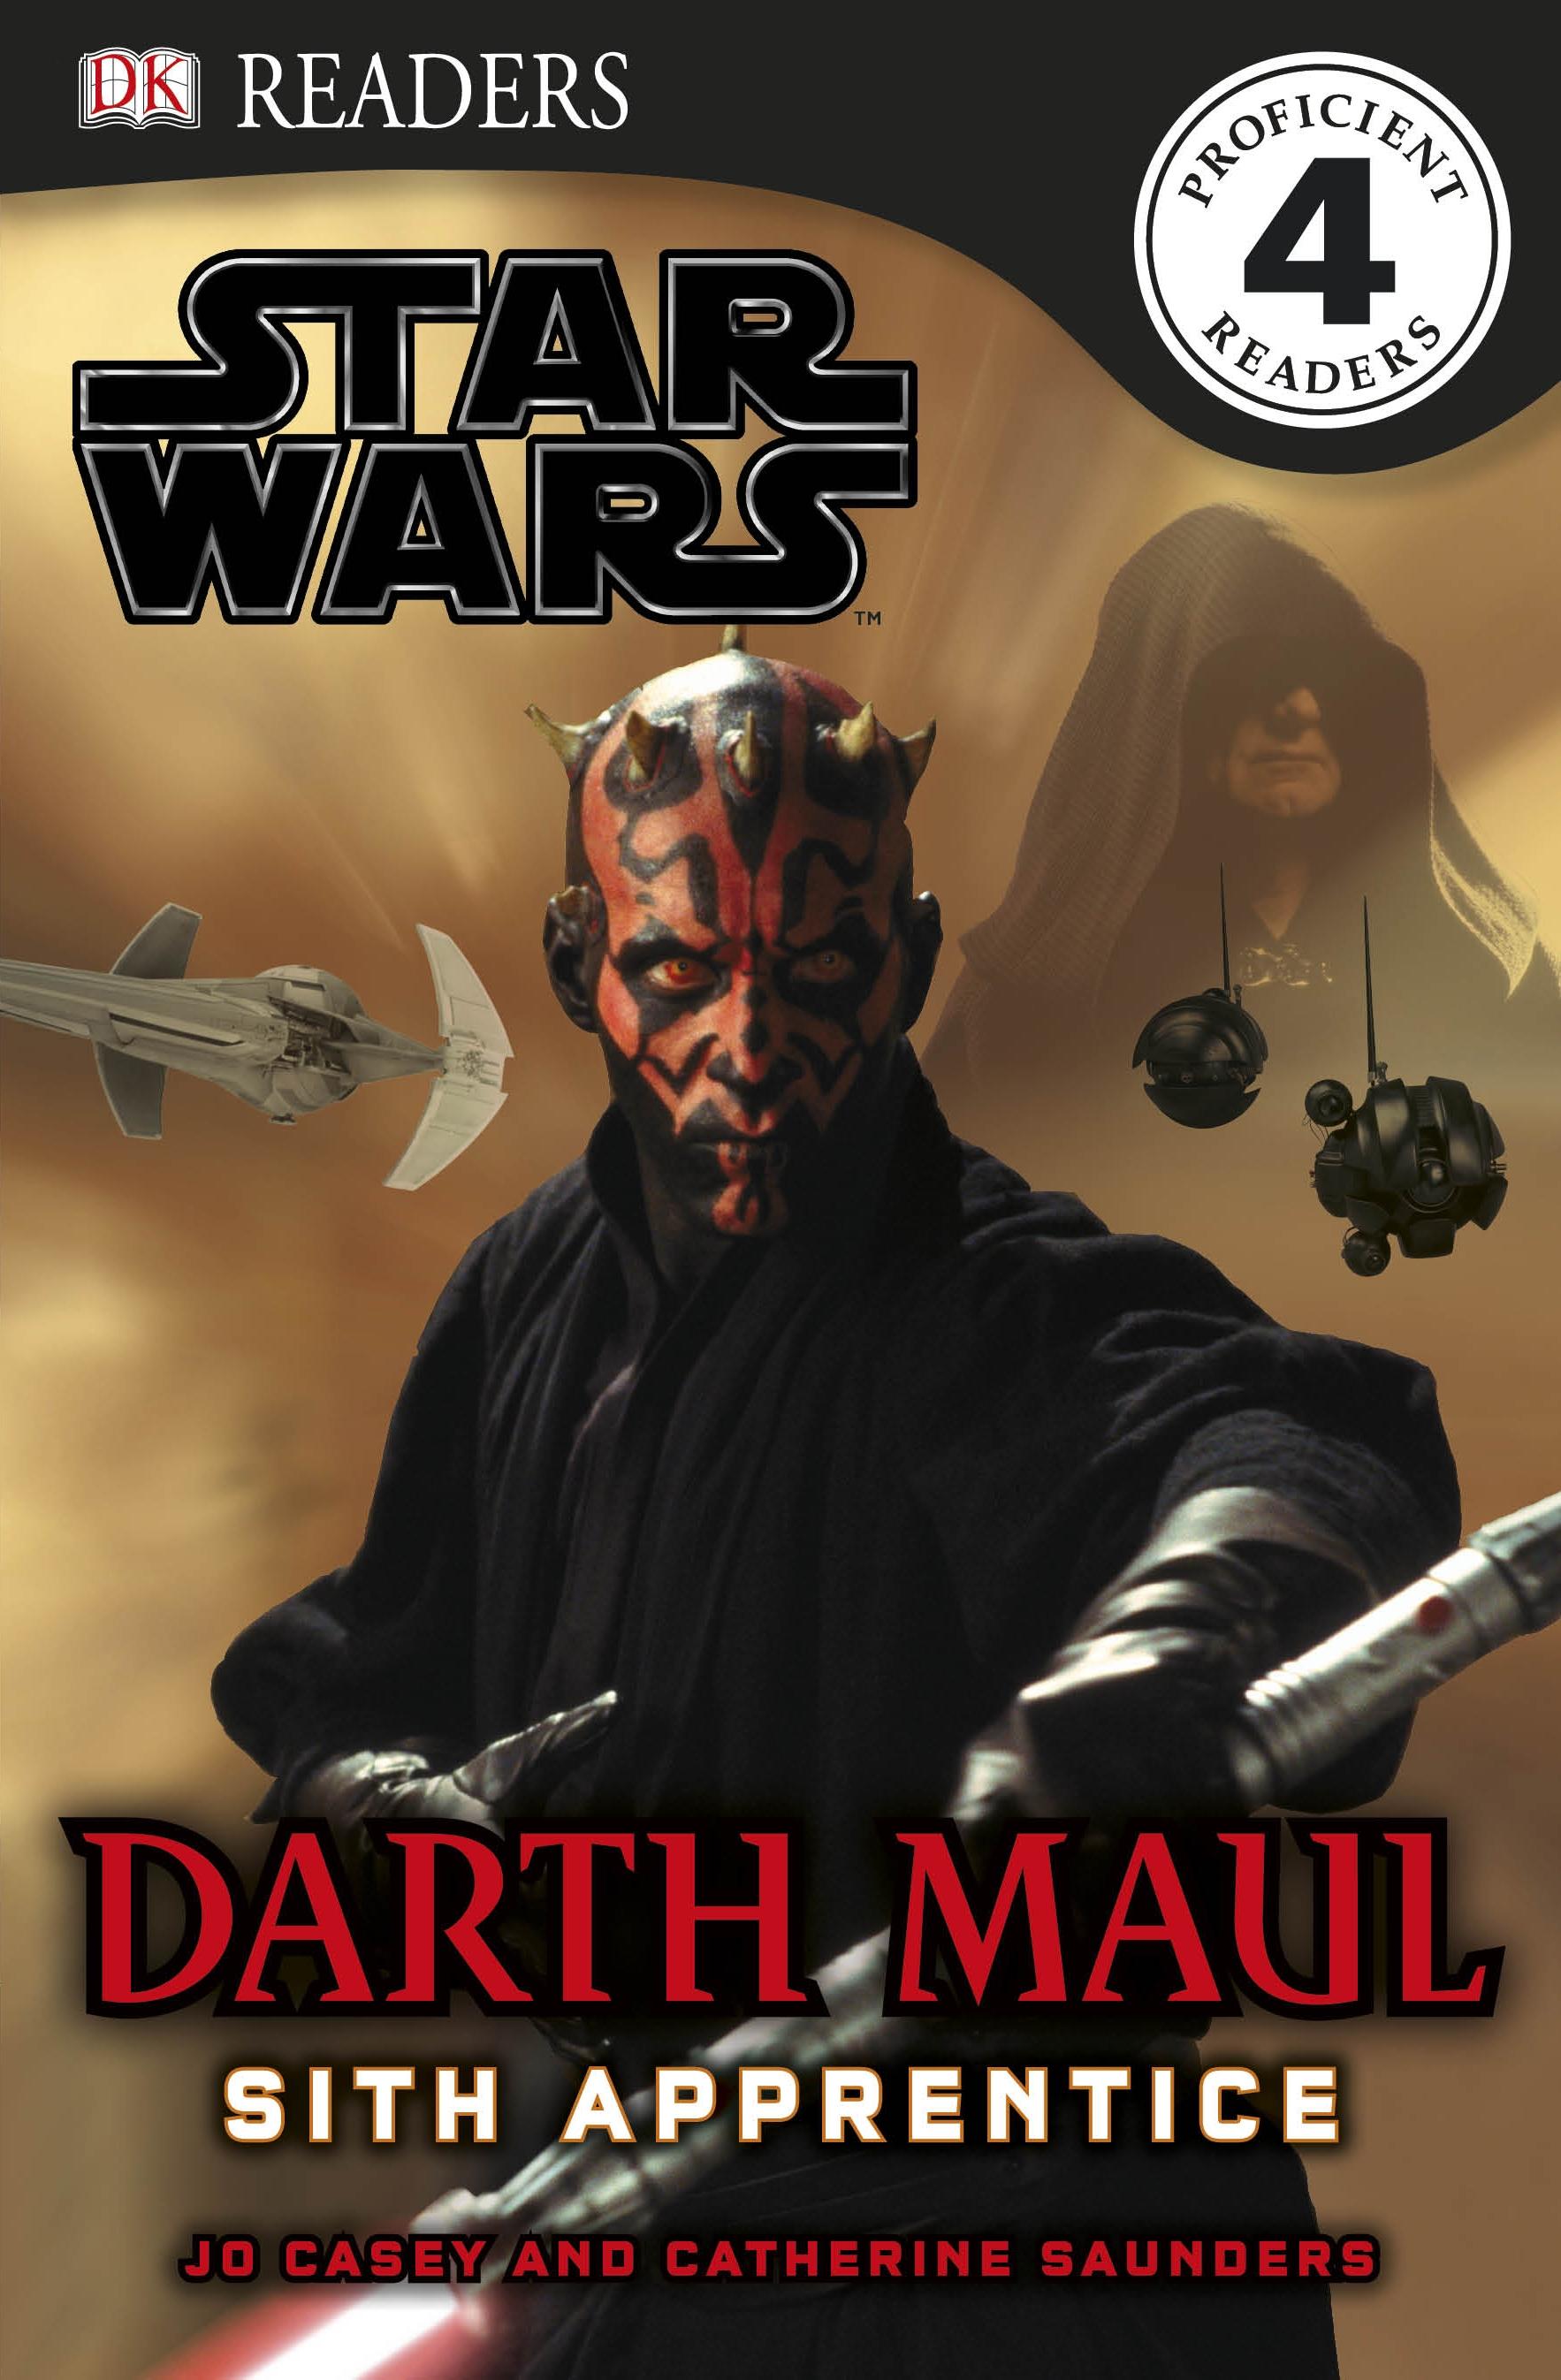 Star Wars: Darth Maul, Sith Apprentice